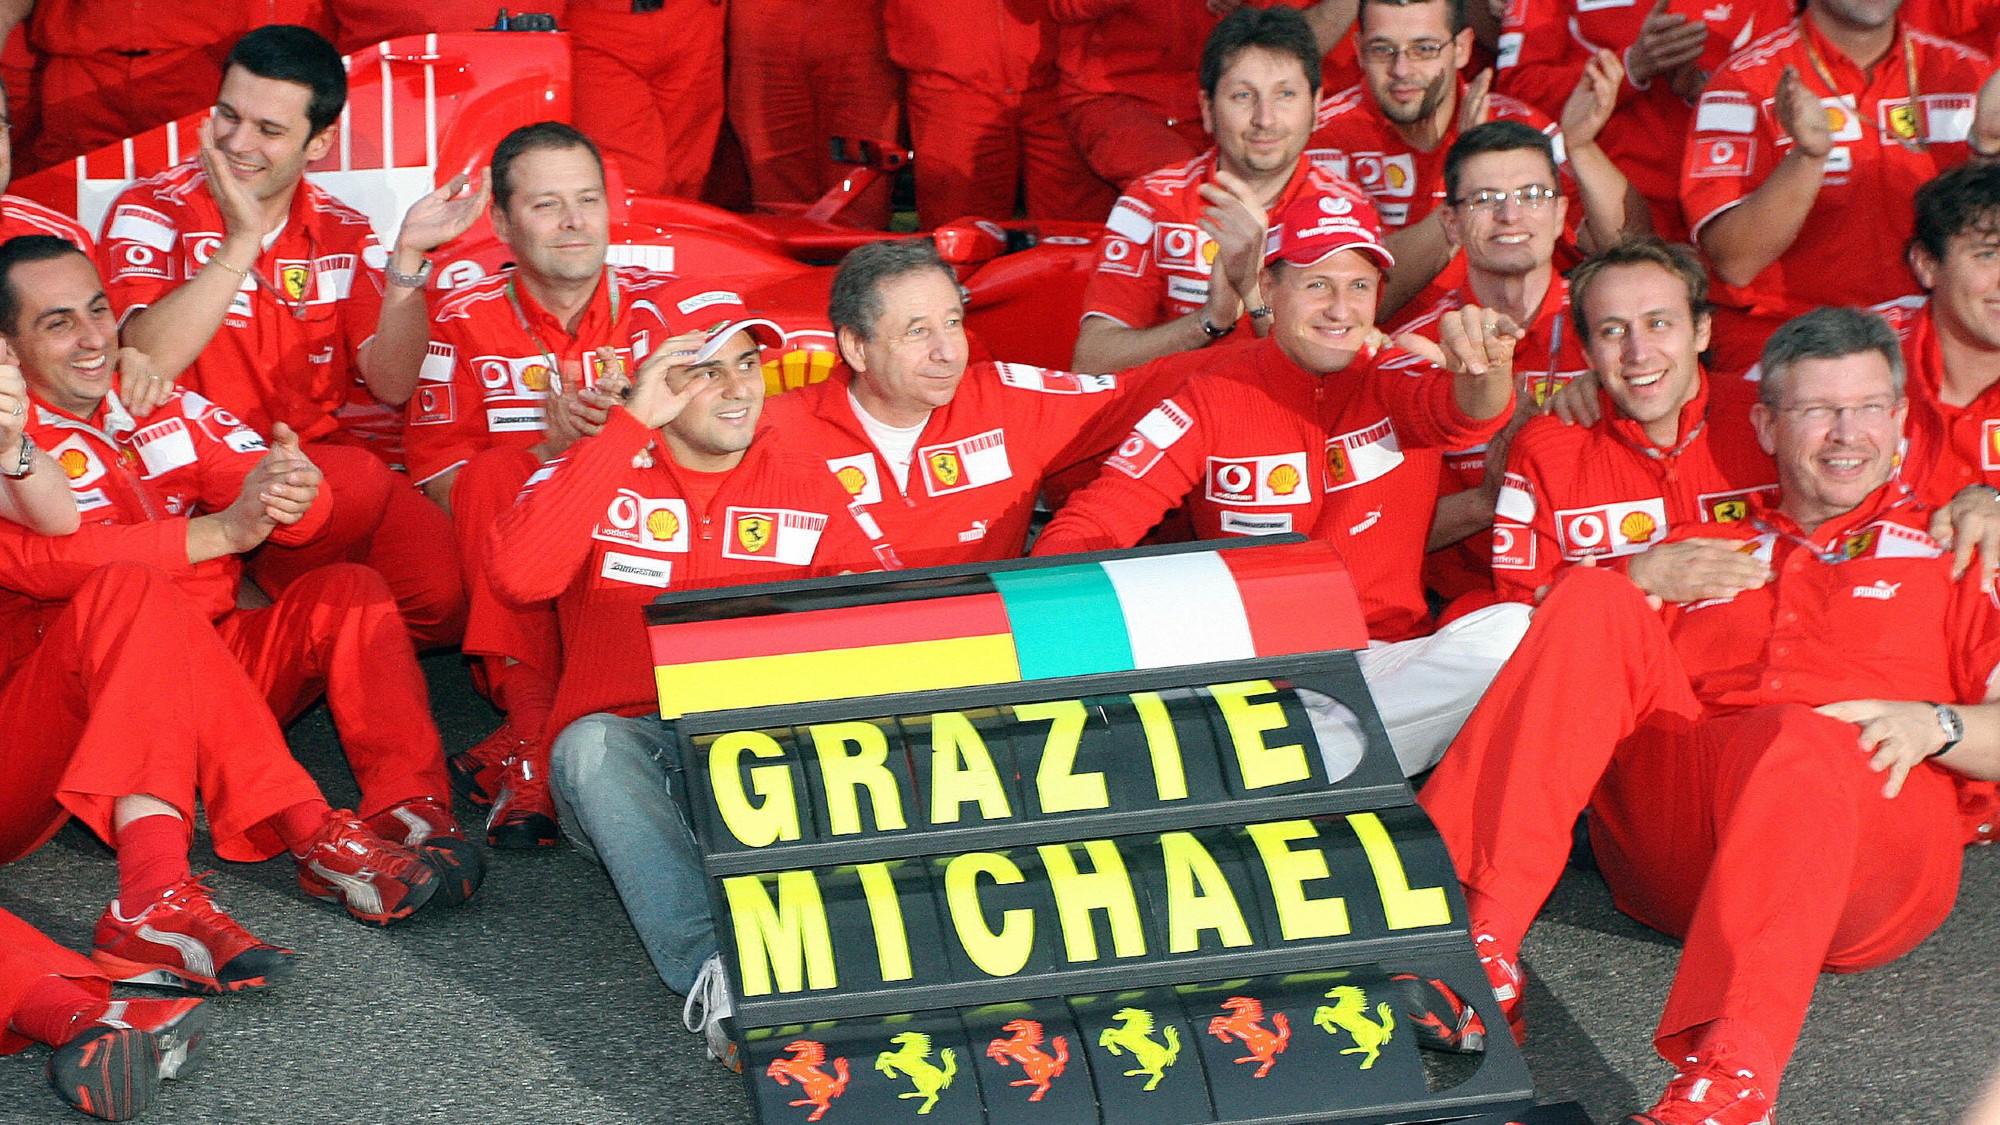 2006 Brazilian gp, Michael Schumacher